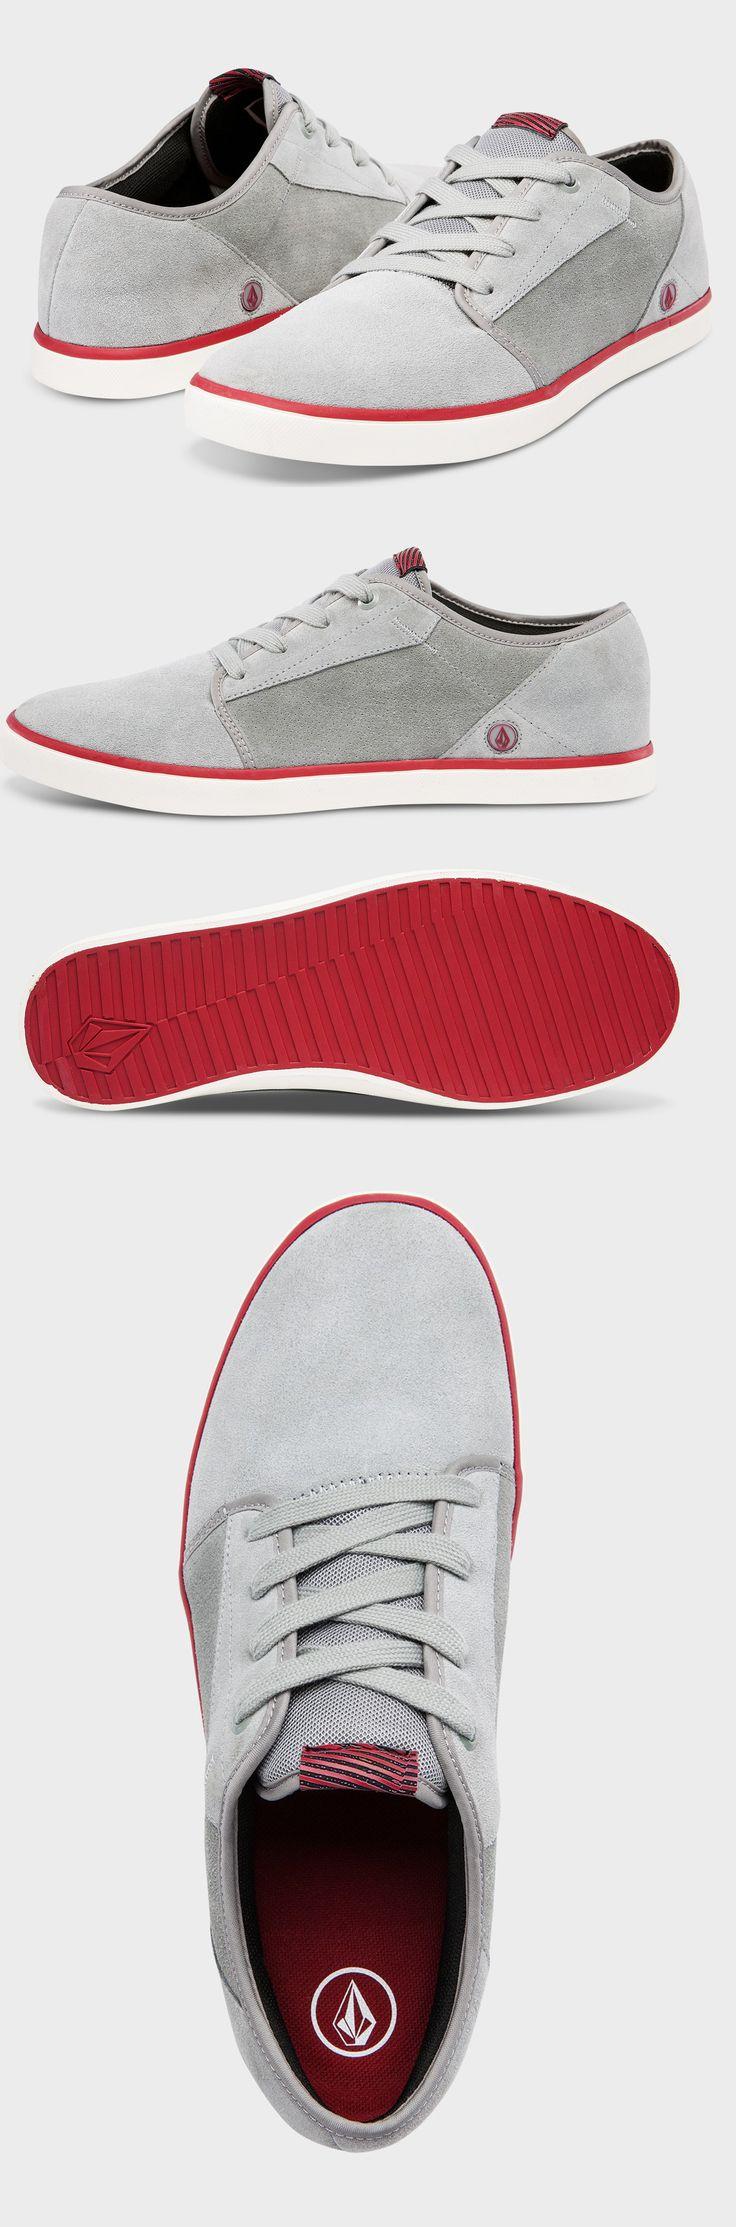 Volcom Footwear // Grimm shoes in grey